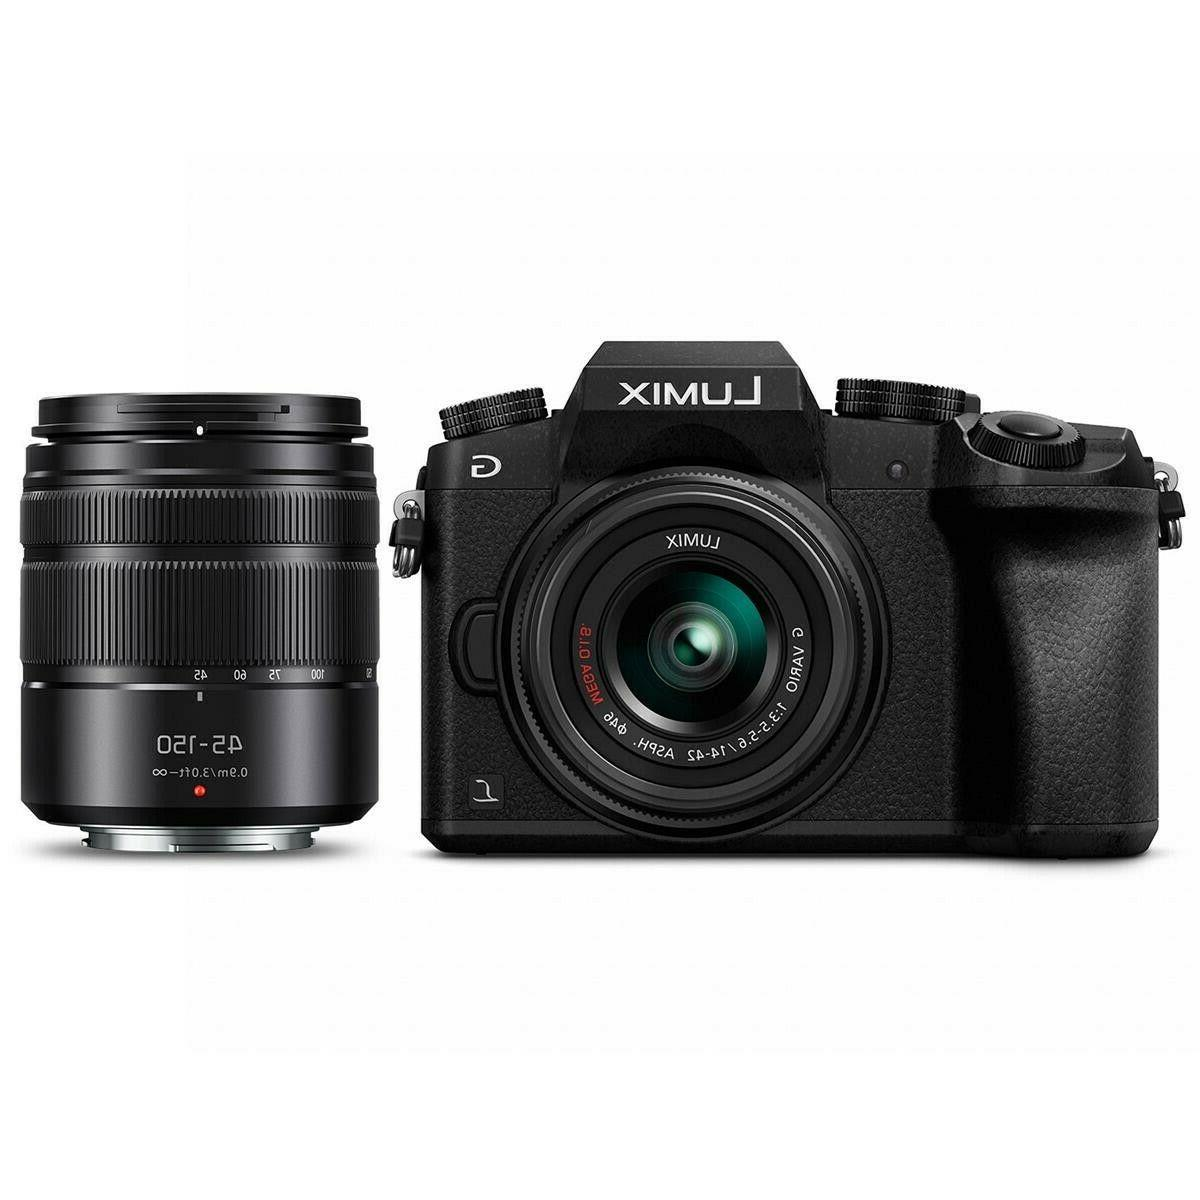 w/ 14-42mm & Lens + Accessory Kit